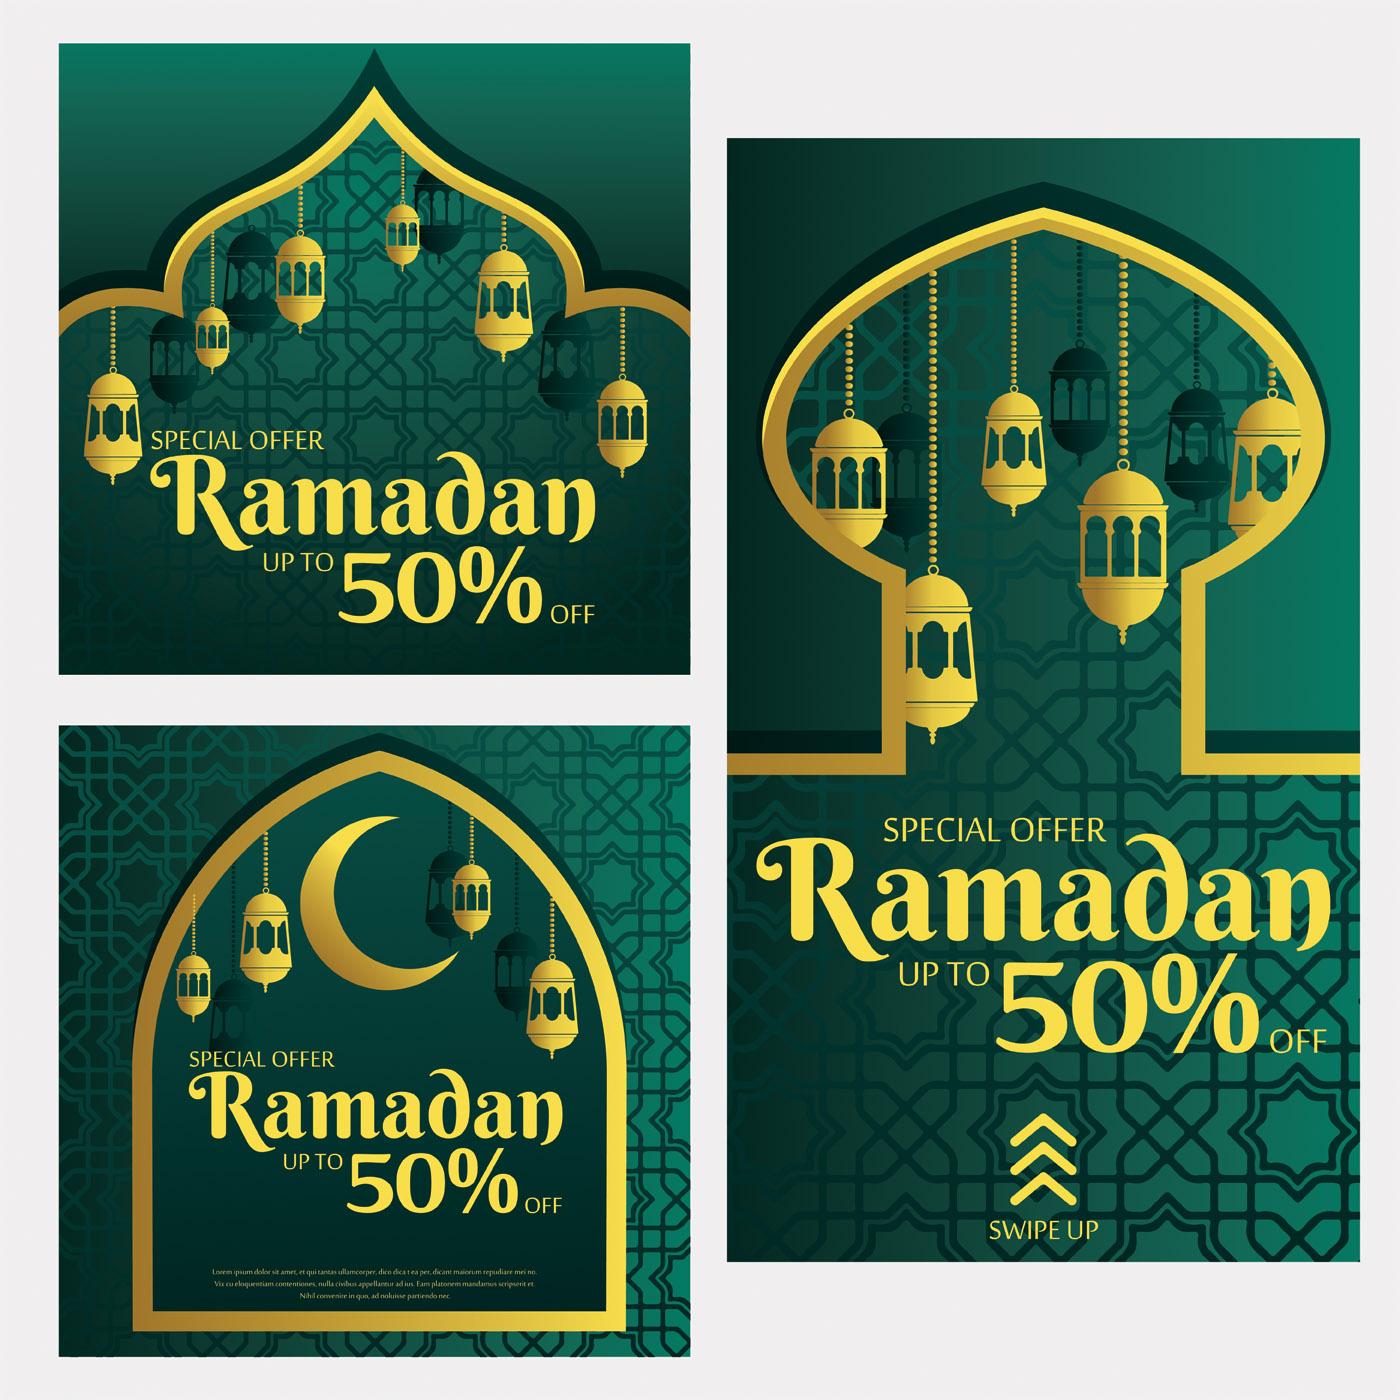 Vector Illustration Instagram: Instagram Ramadan Sale Template Vector Pack